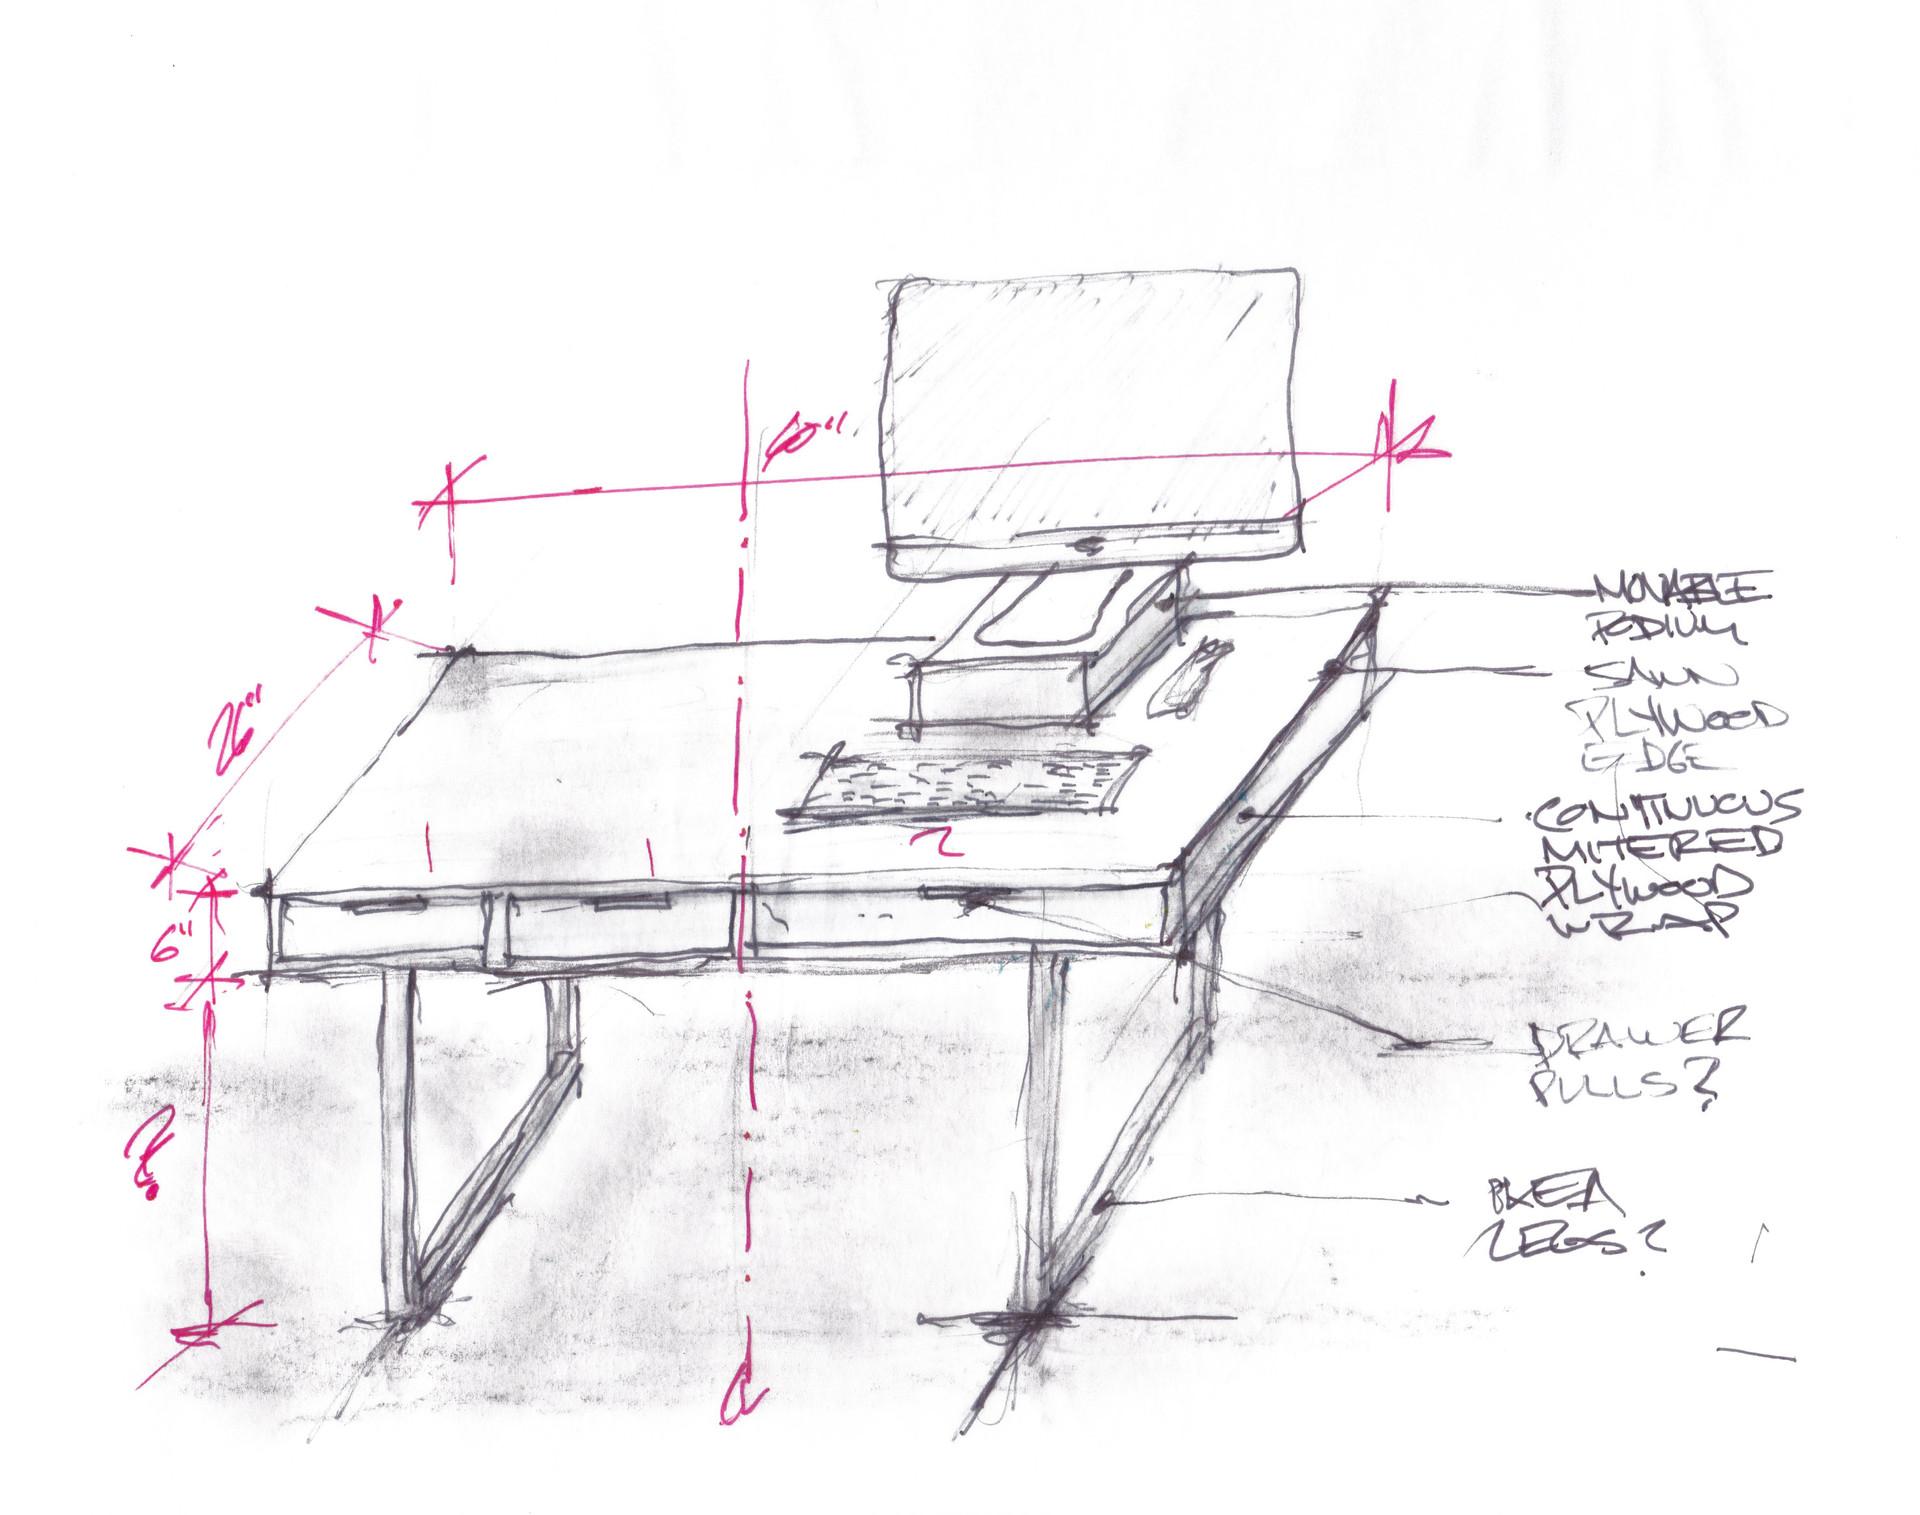 DeskSketch_08_01_16.jpeg